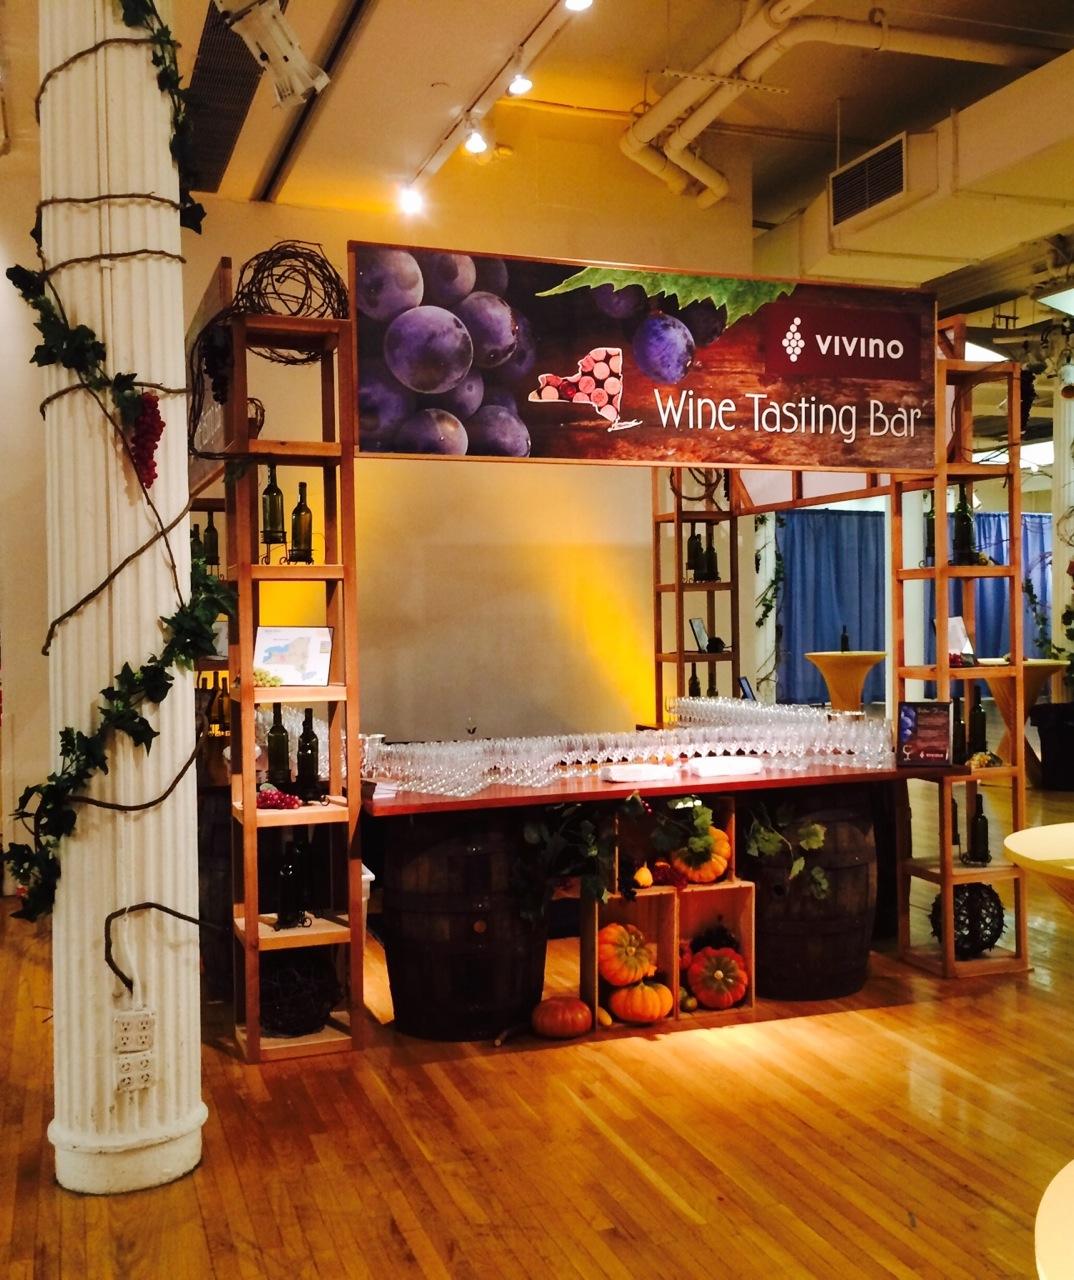 Bar Rental NJ NYC Eggsotic Events Wine Bar with Shelves Vineyard Theme 1.jpg